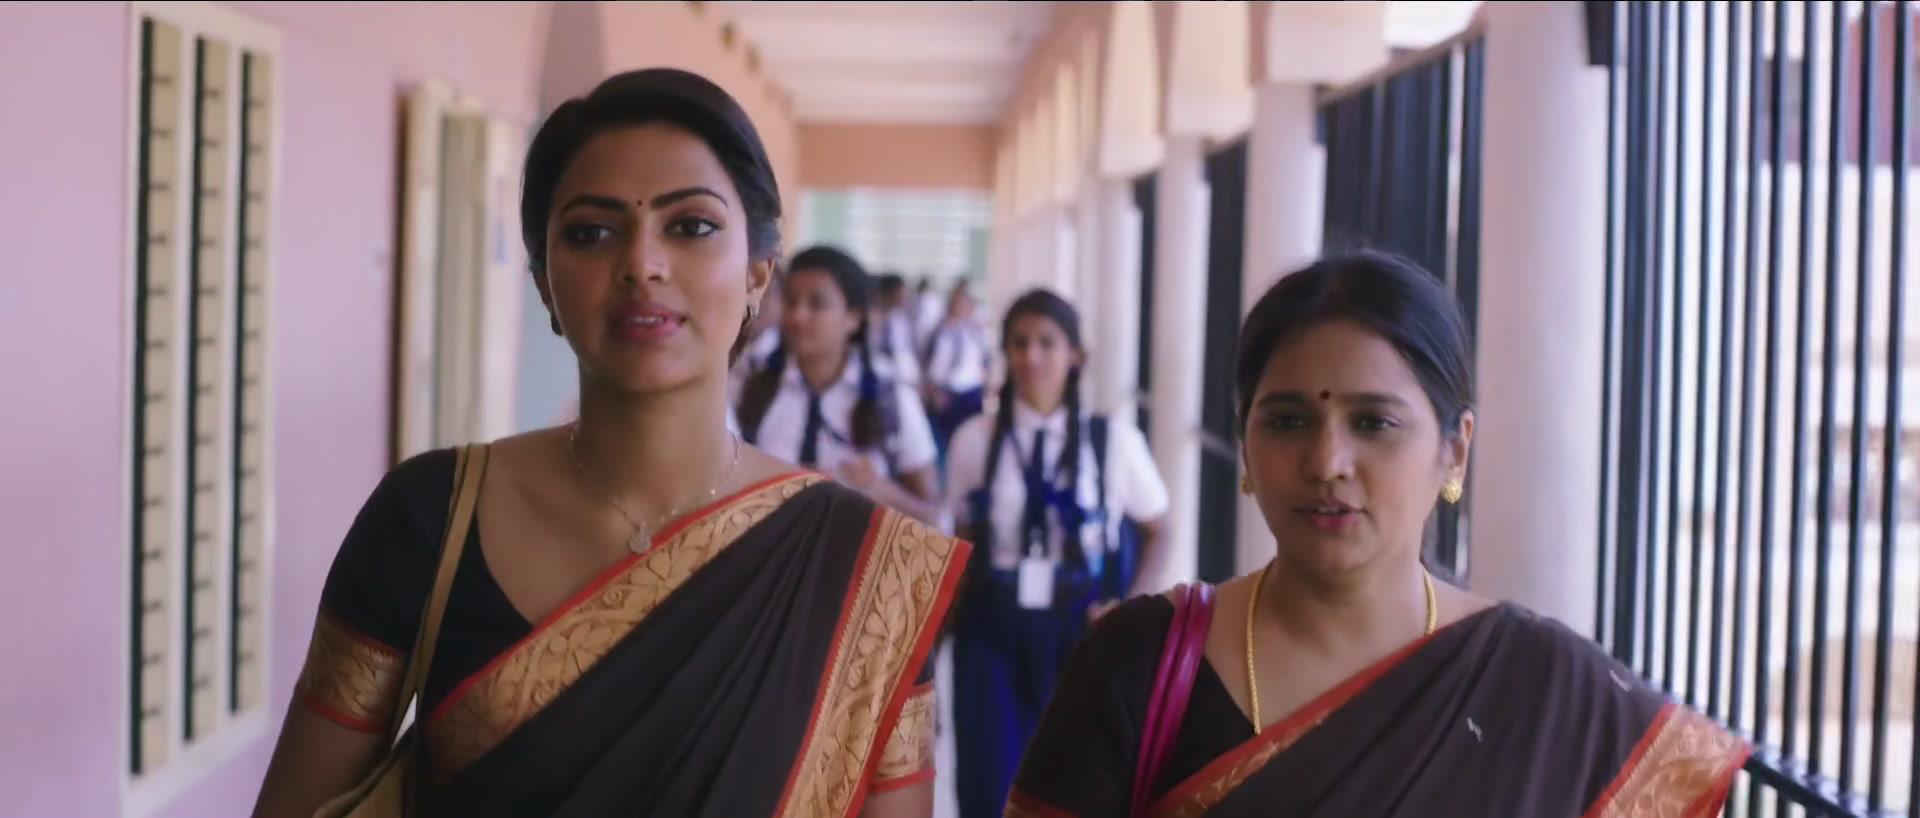 Ratsasan (2018) 1080p 10bit HDRip x265 HEVC ESub [Dual Audio][Hindi-Tami]